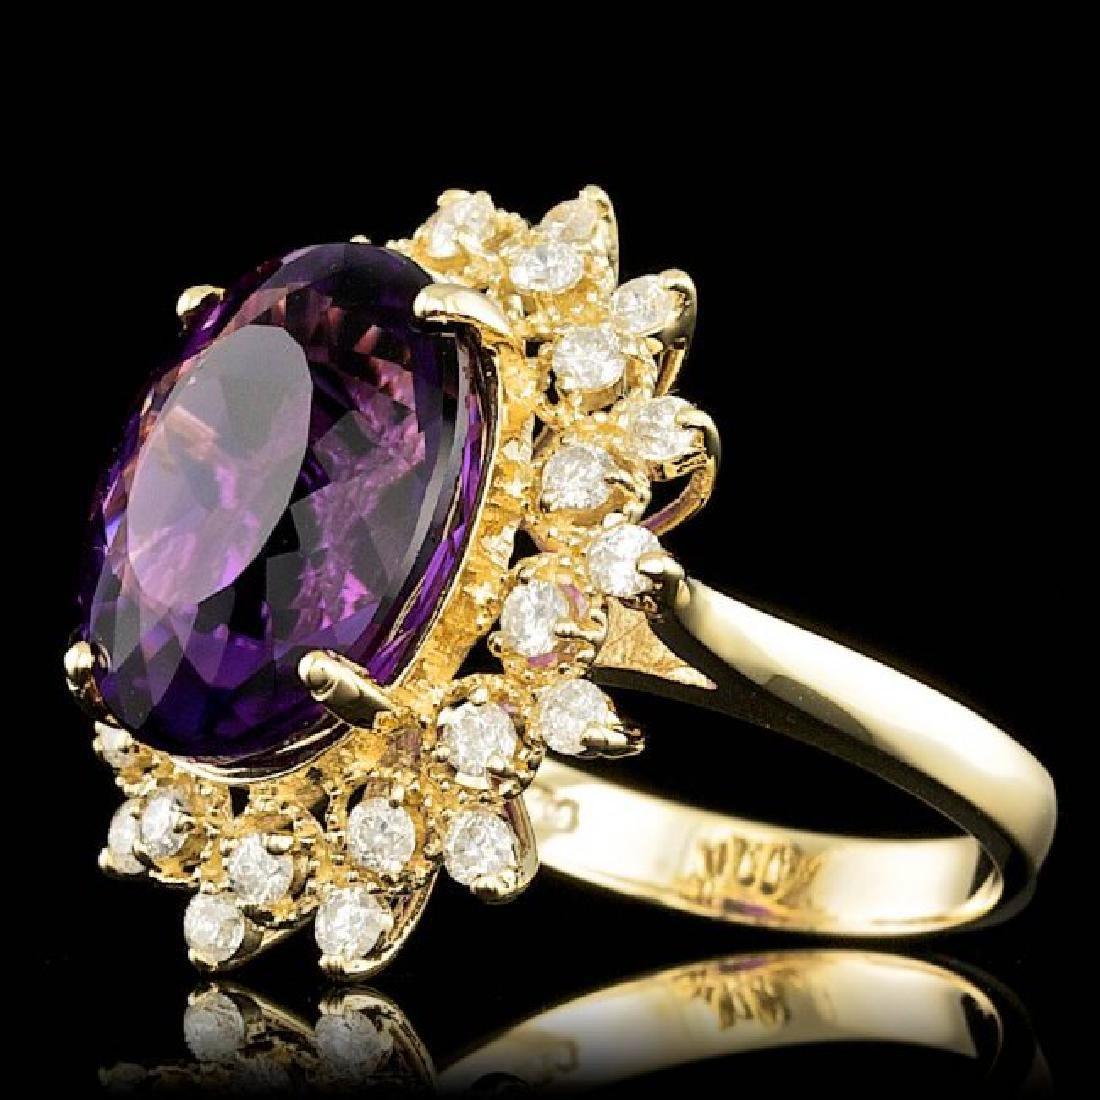 14k Gold 8.00ct Amethyst 0.80ct Diamond Ring - 2